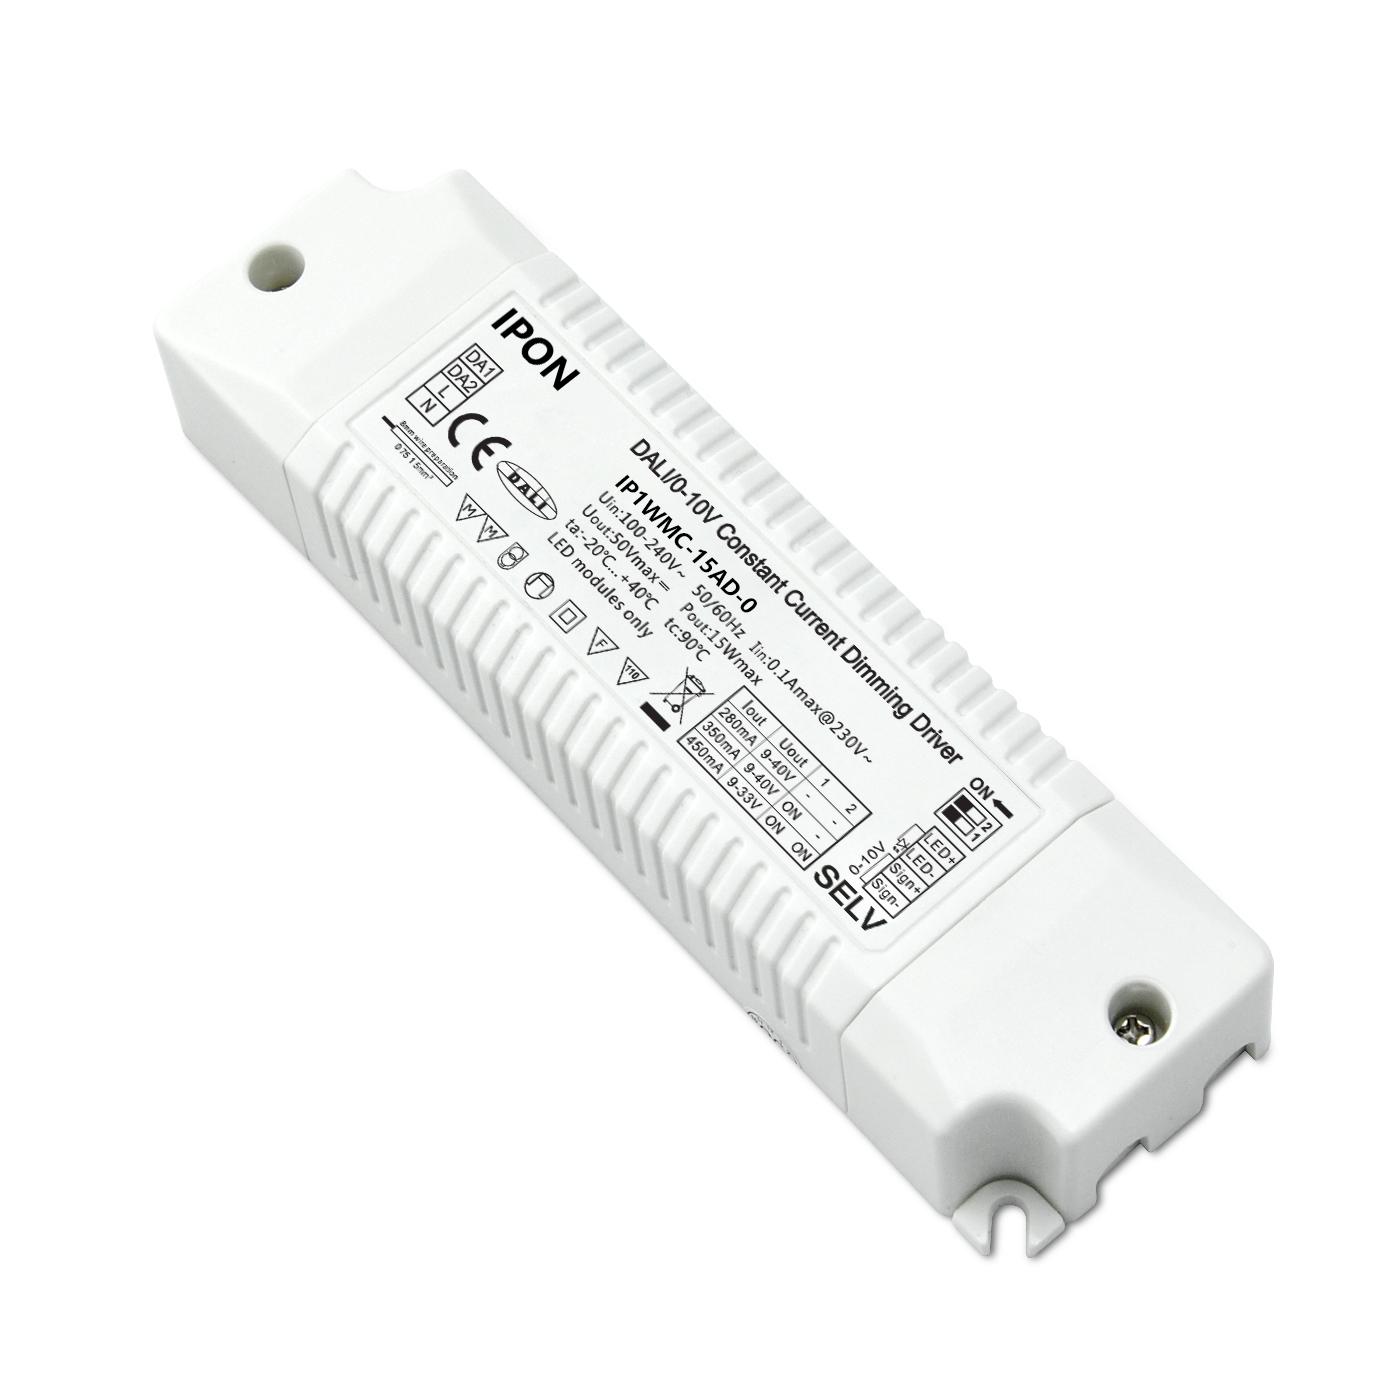 IPON LED Array image73